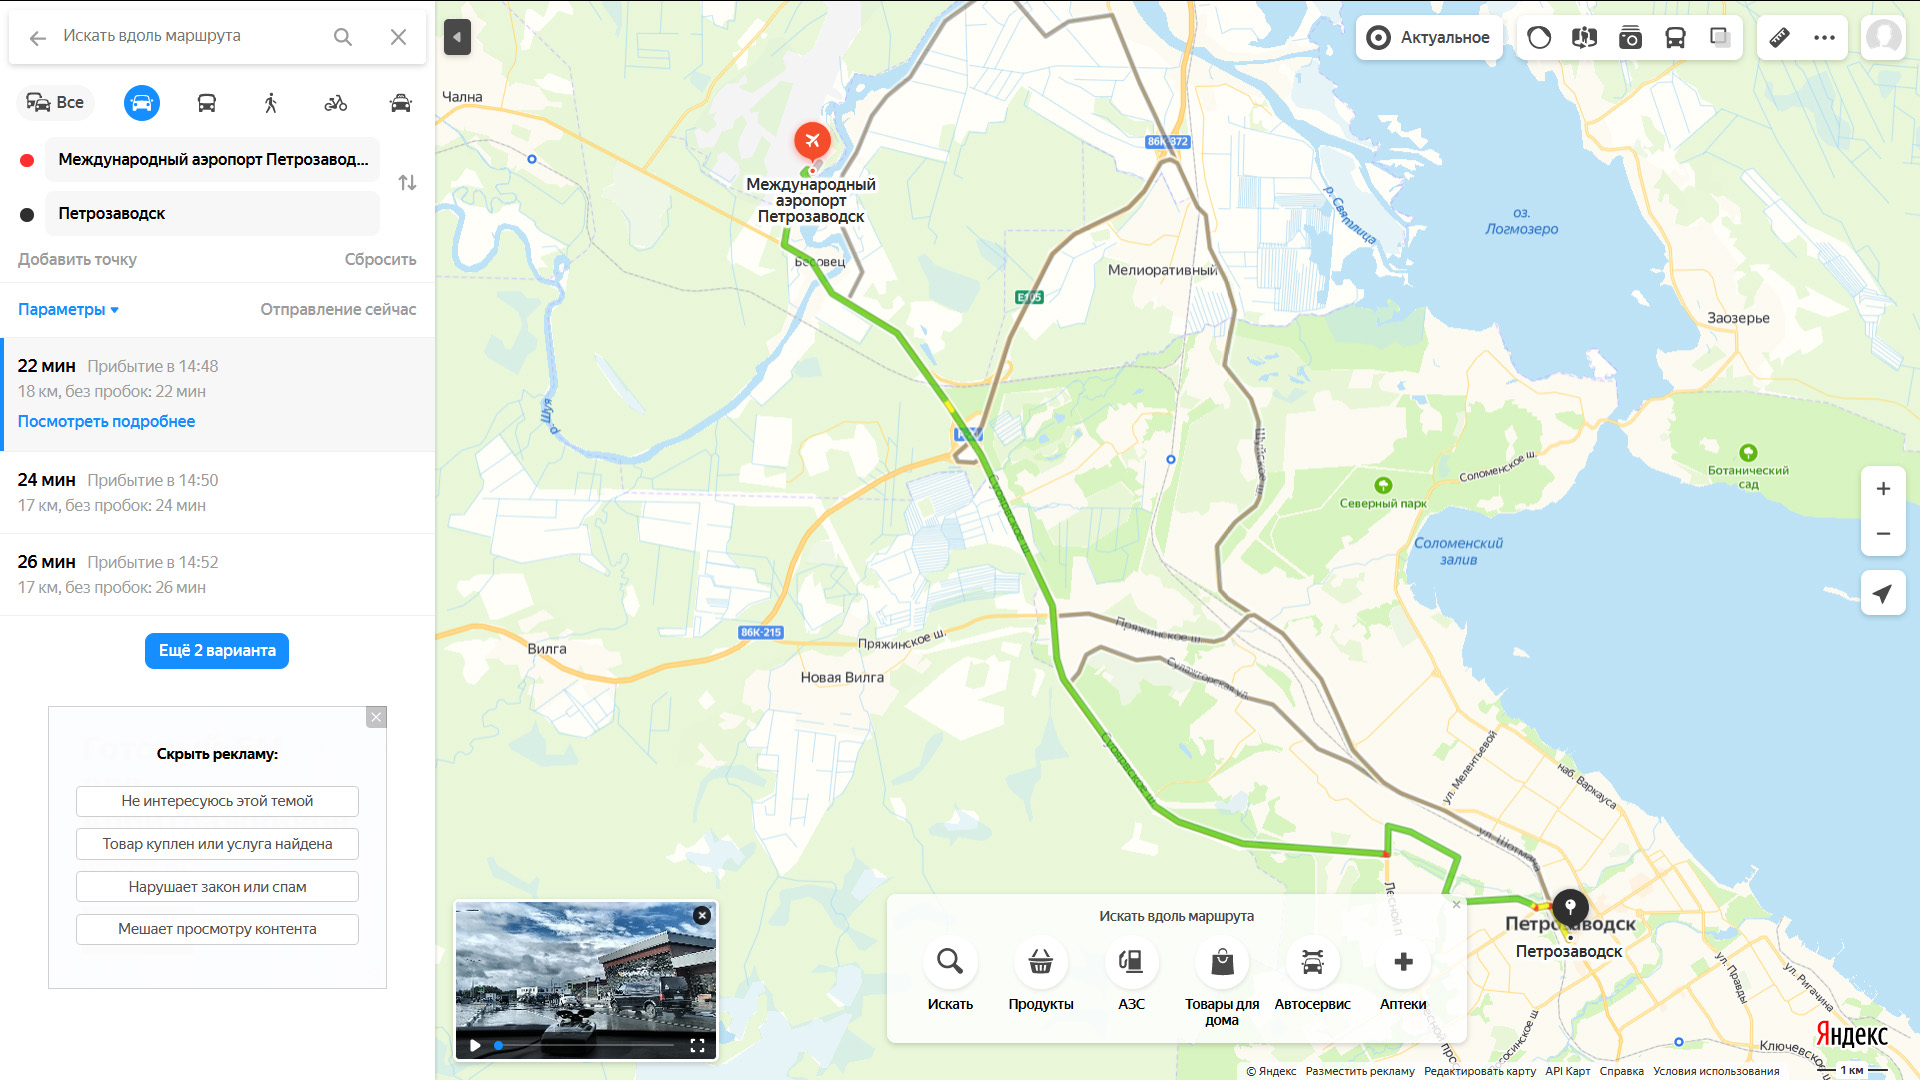 Аэропорт Петрозаводск где находится точка на карте